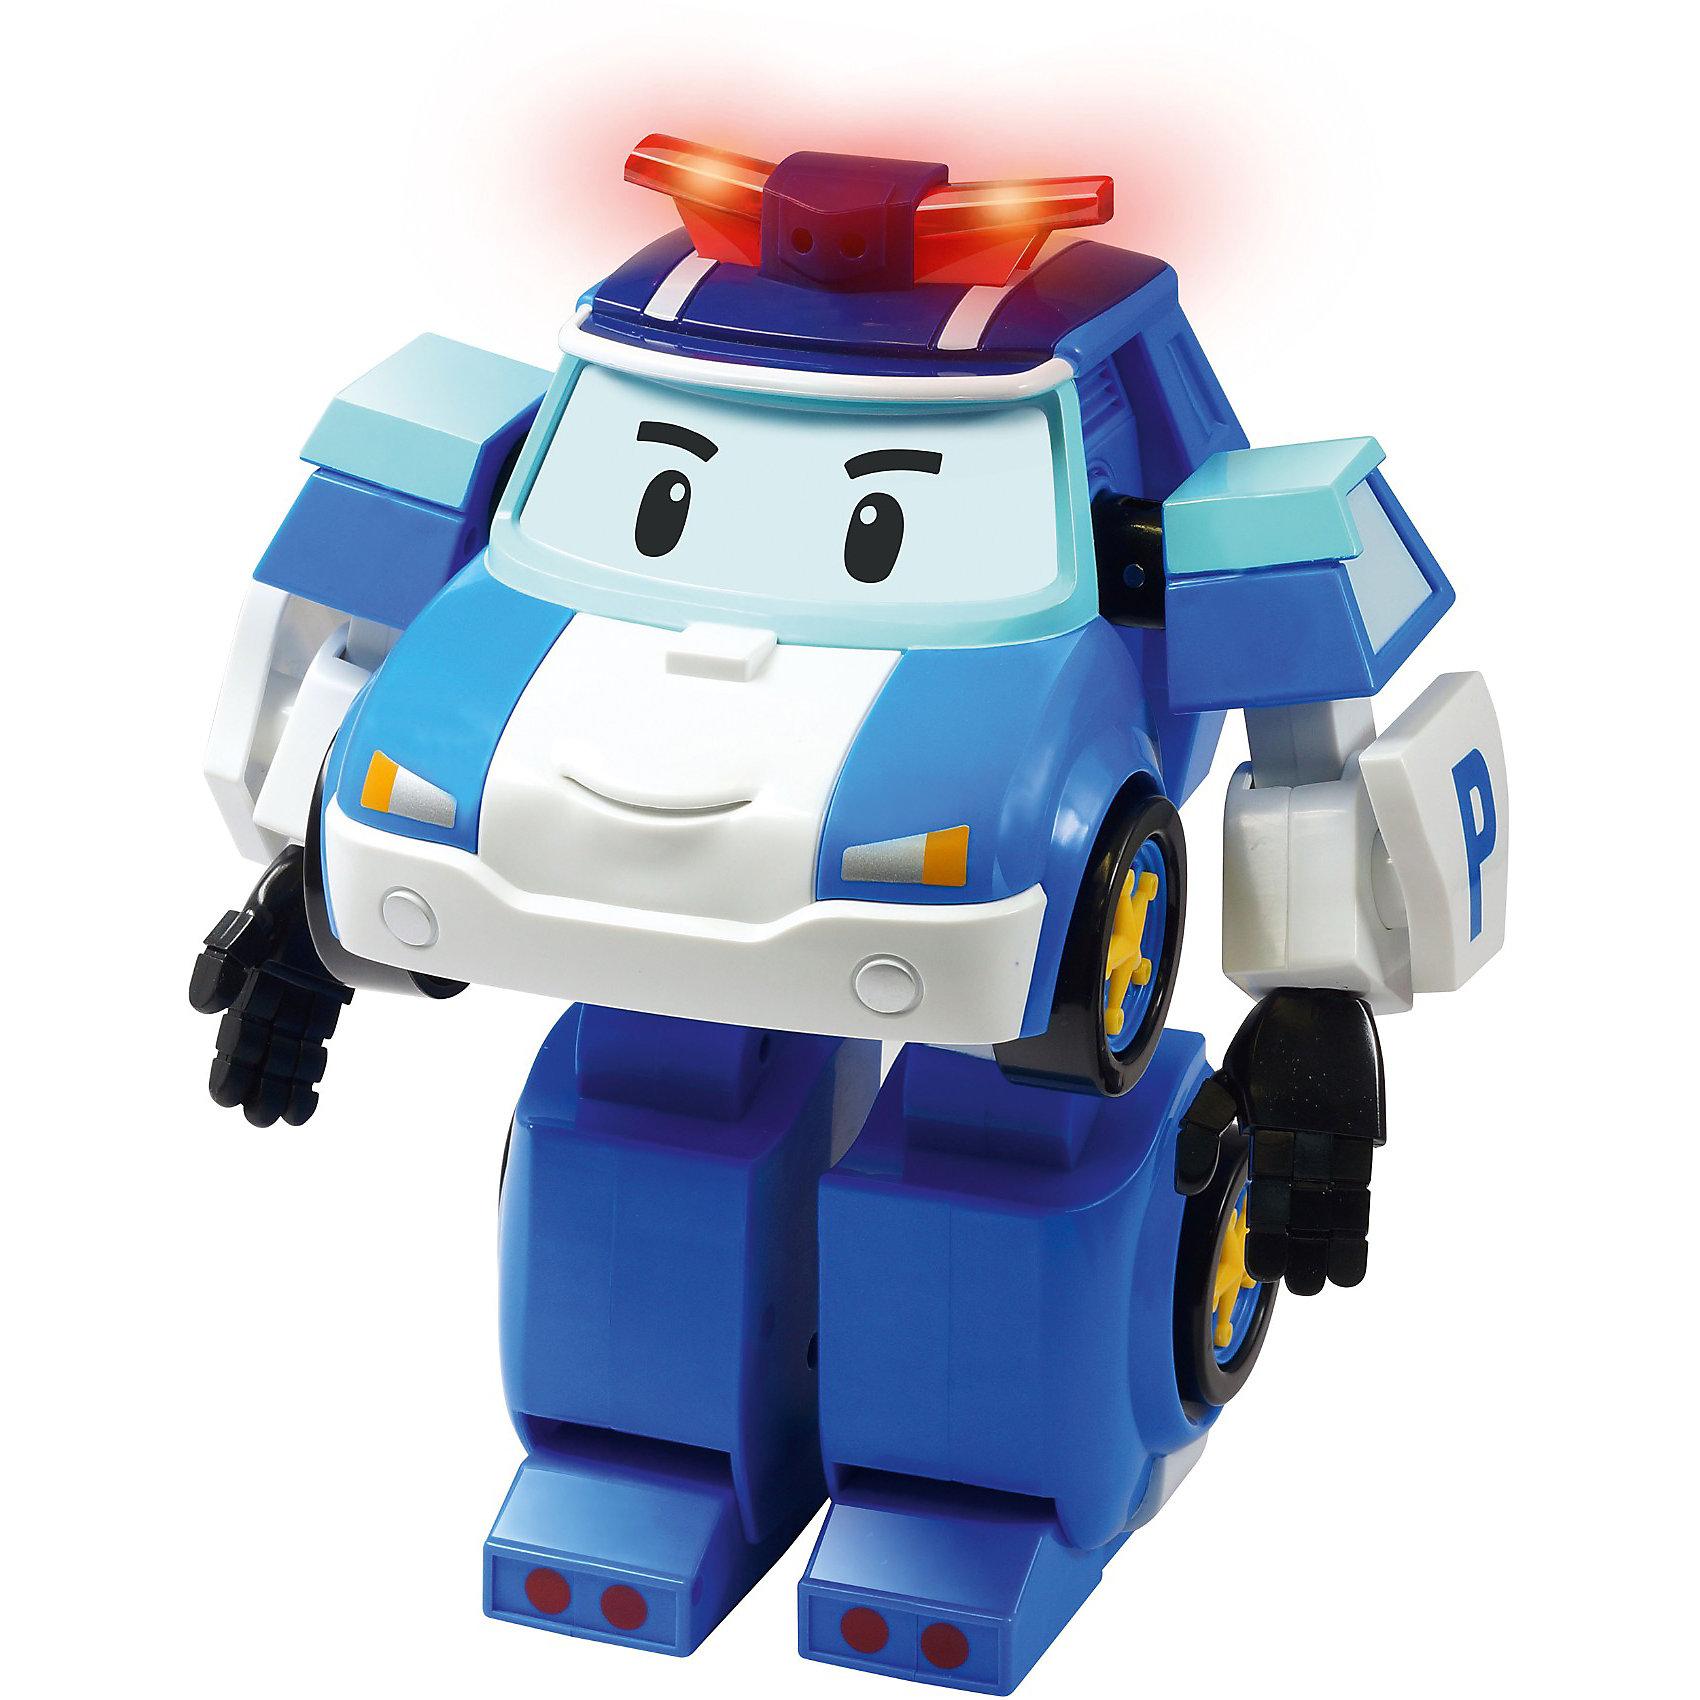 Silverlit Робот-трансформер Поли, р/у, Робокар Поли, 31 см робокар поли 4 выпуска 4 dvd